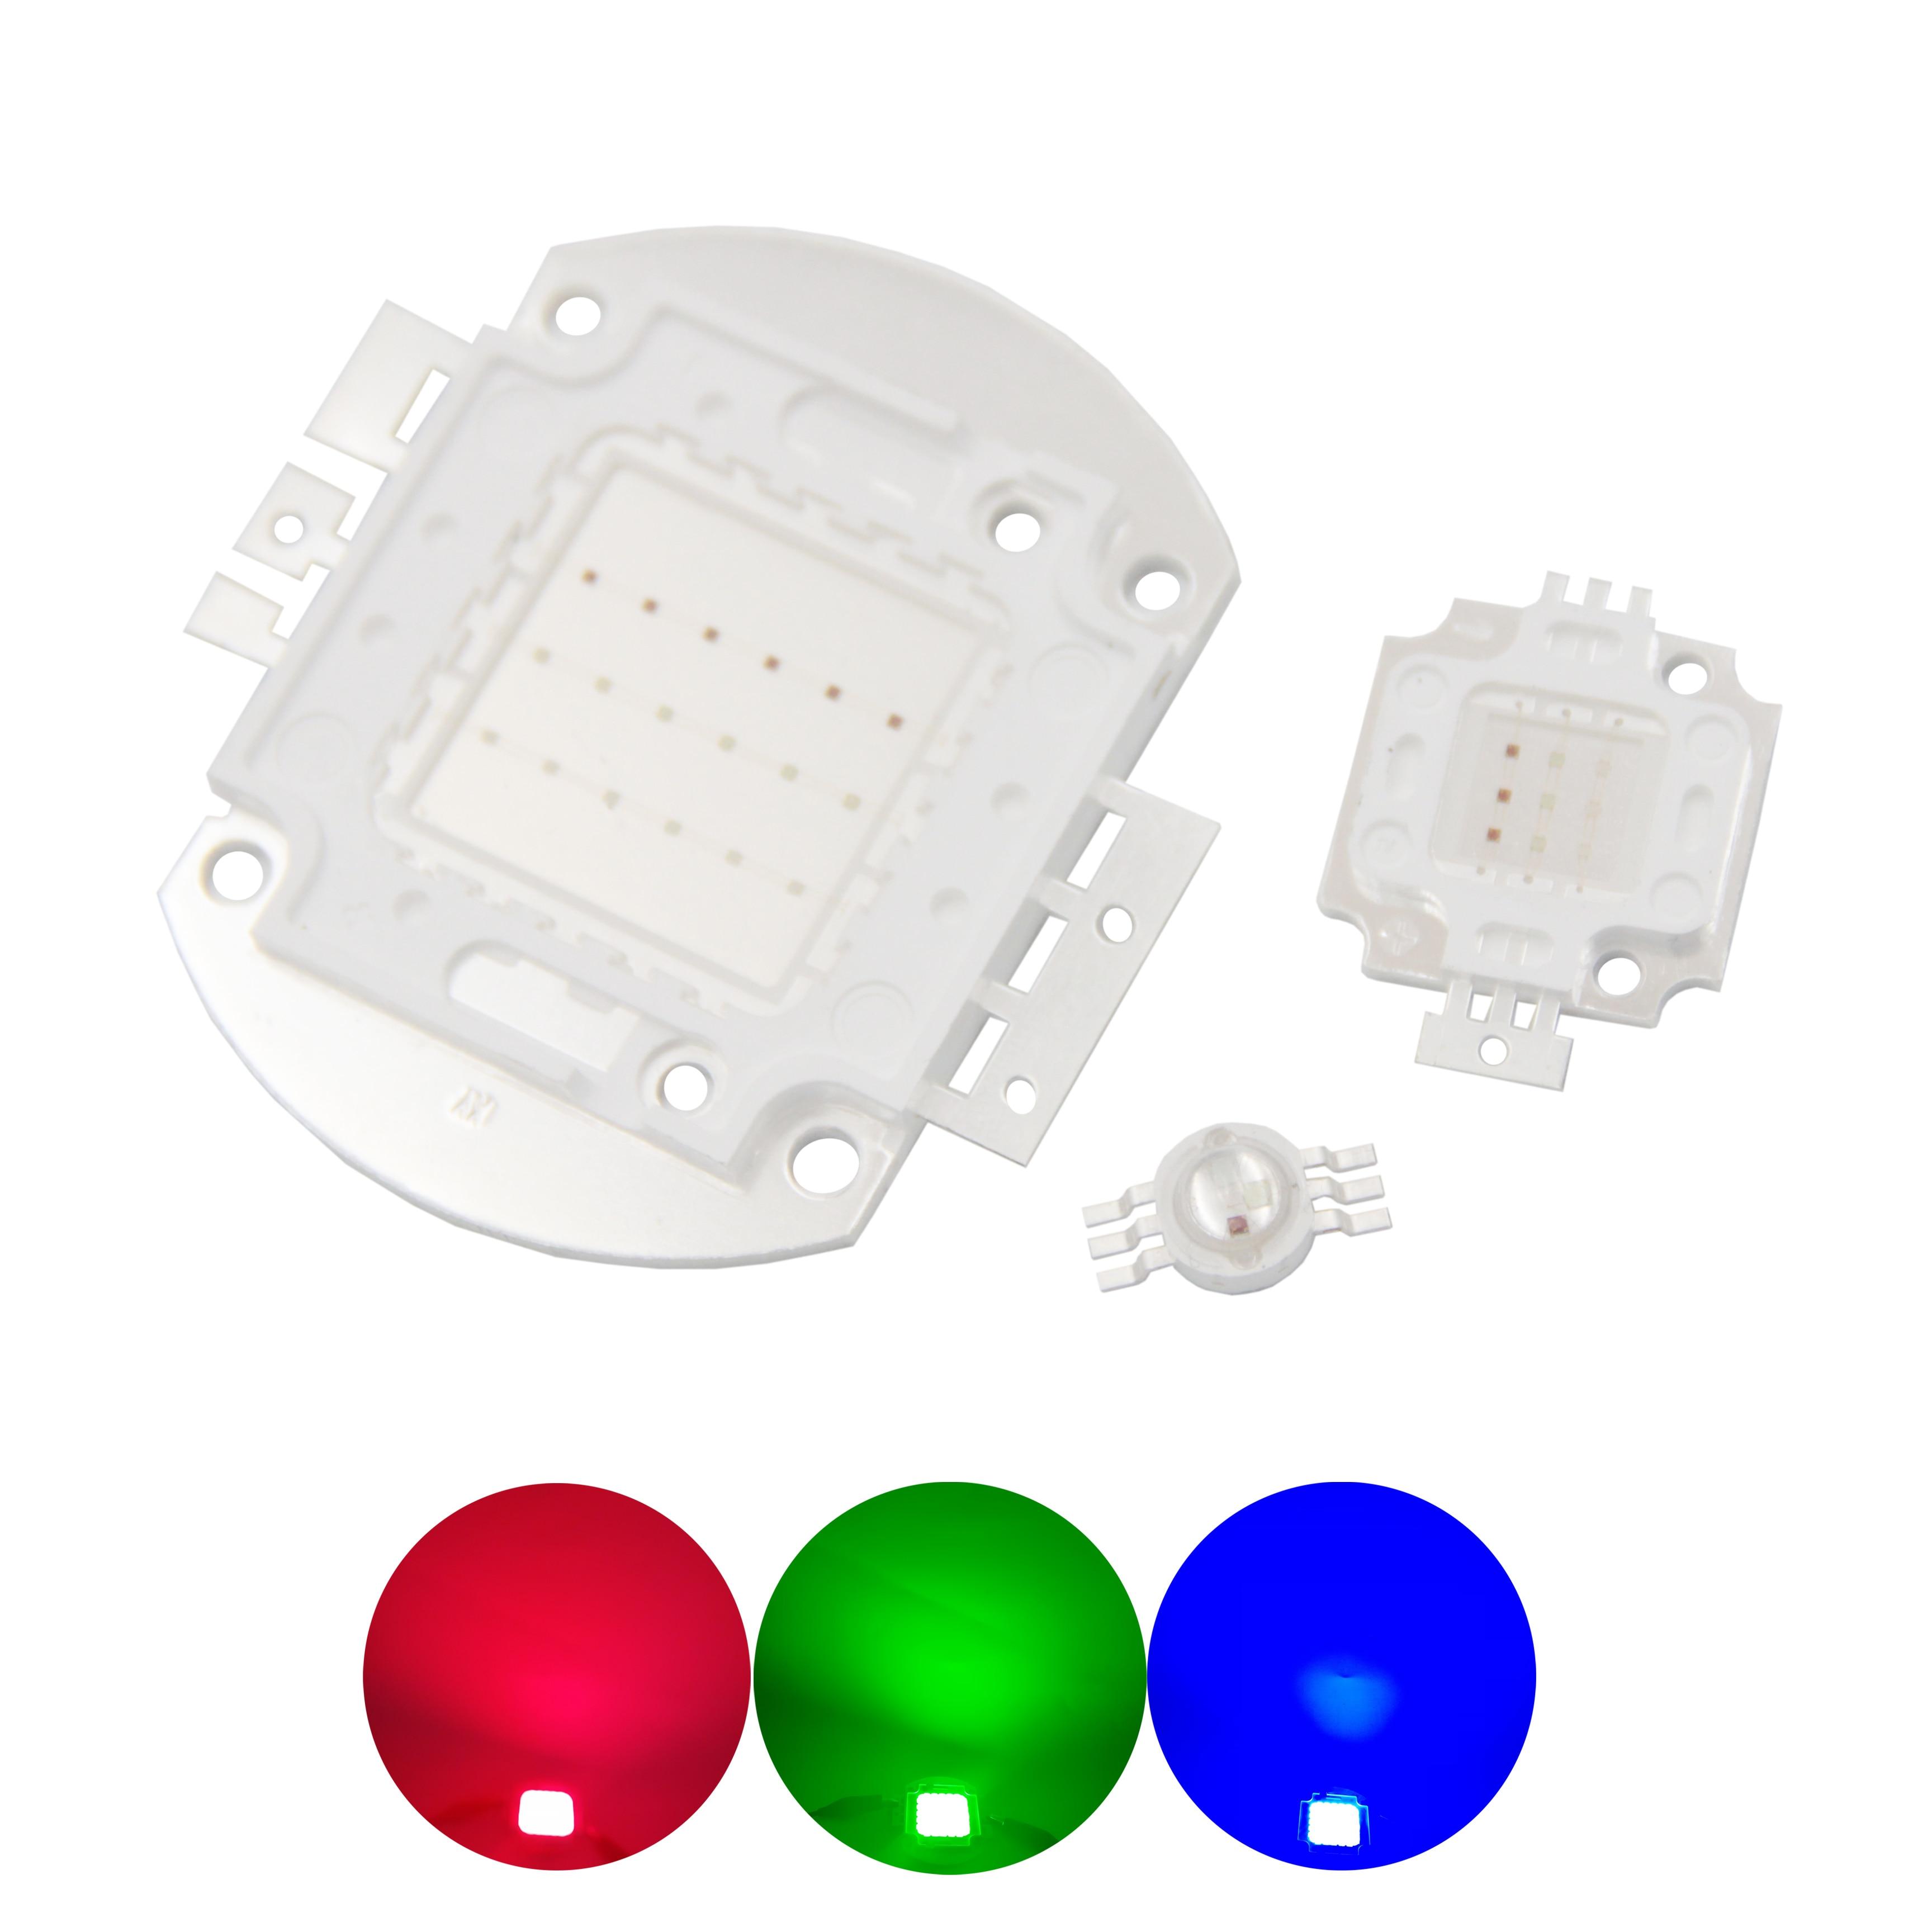 1Pcs 100W Watt High Power Blue 460-470nm SMD LED Chip COB Lamp Lights